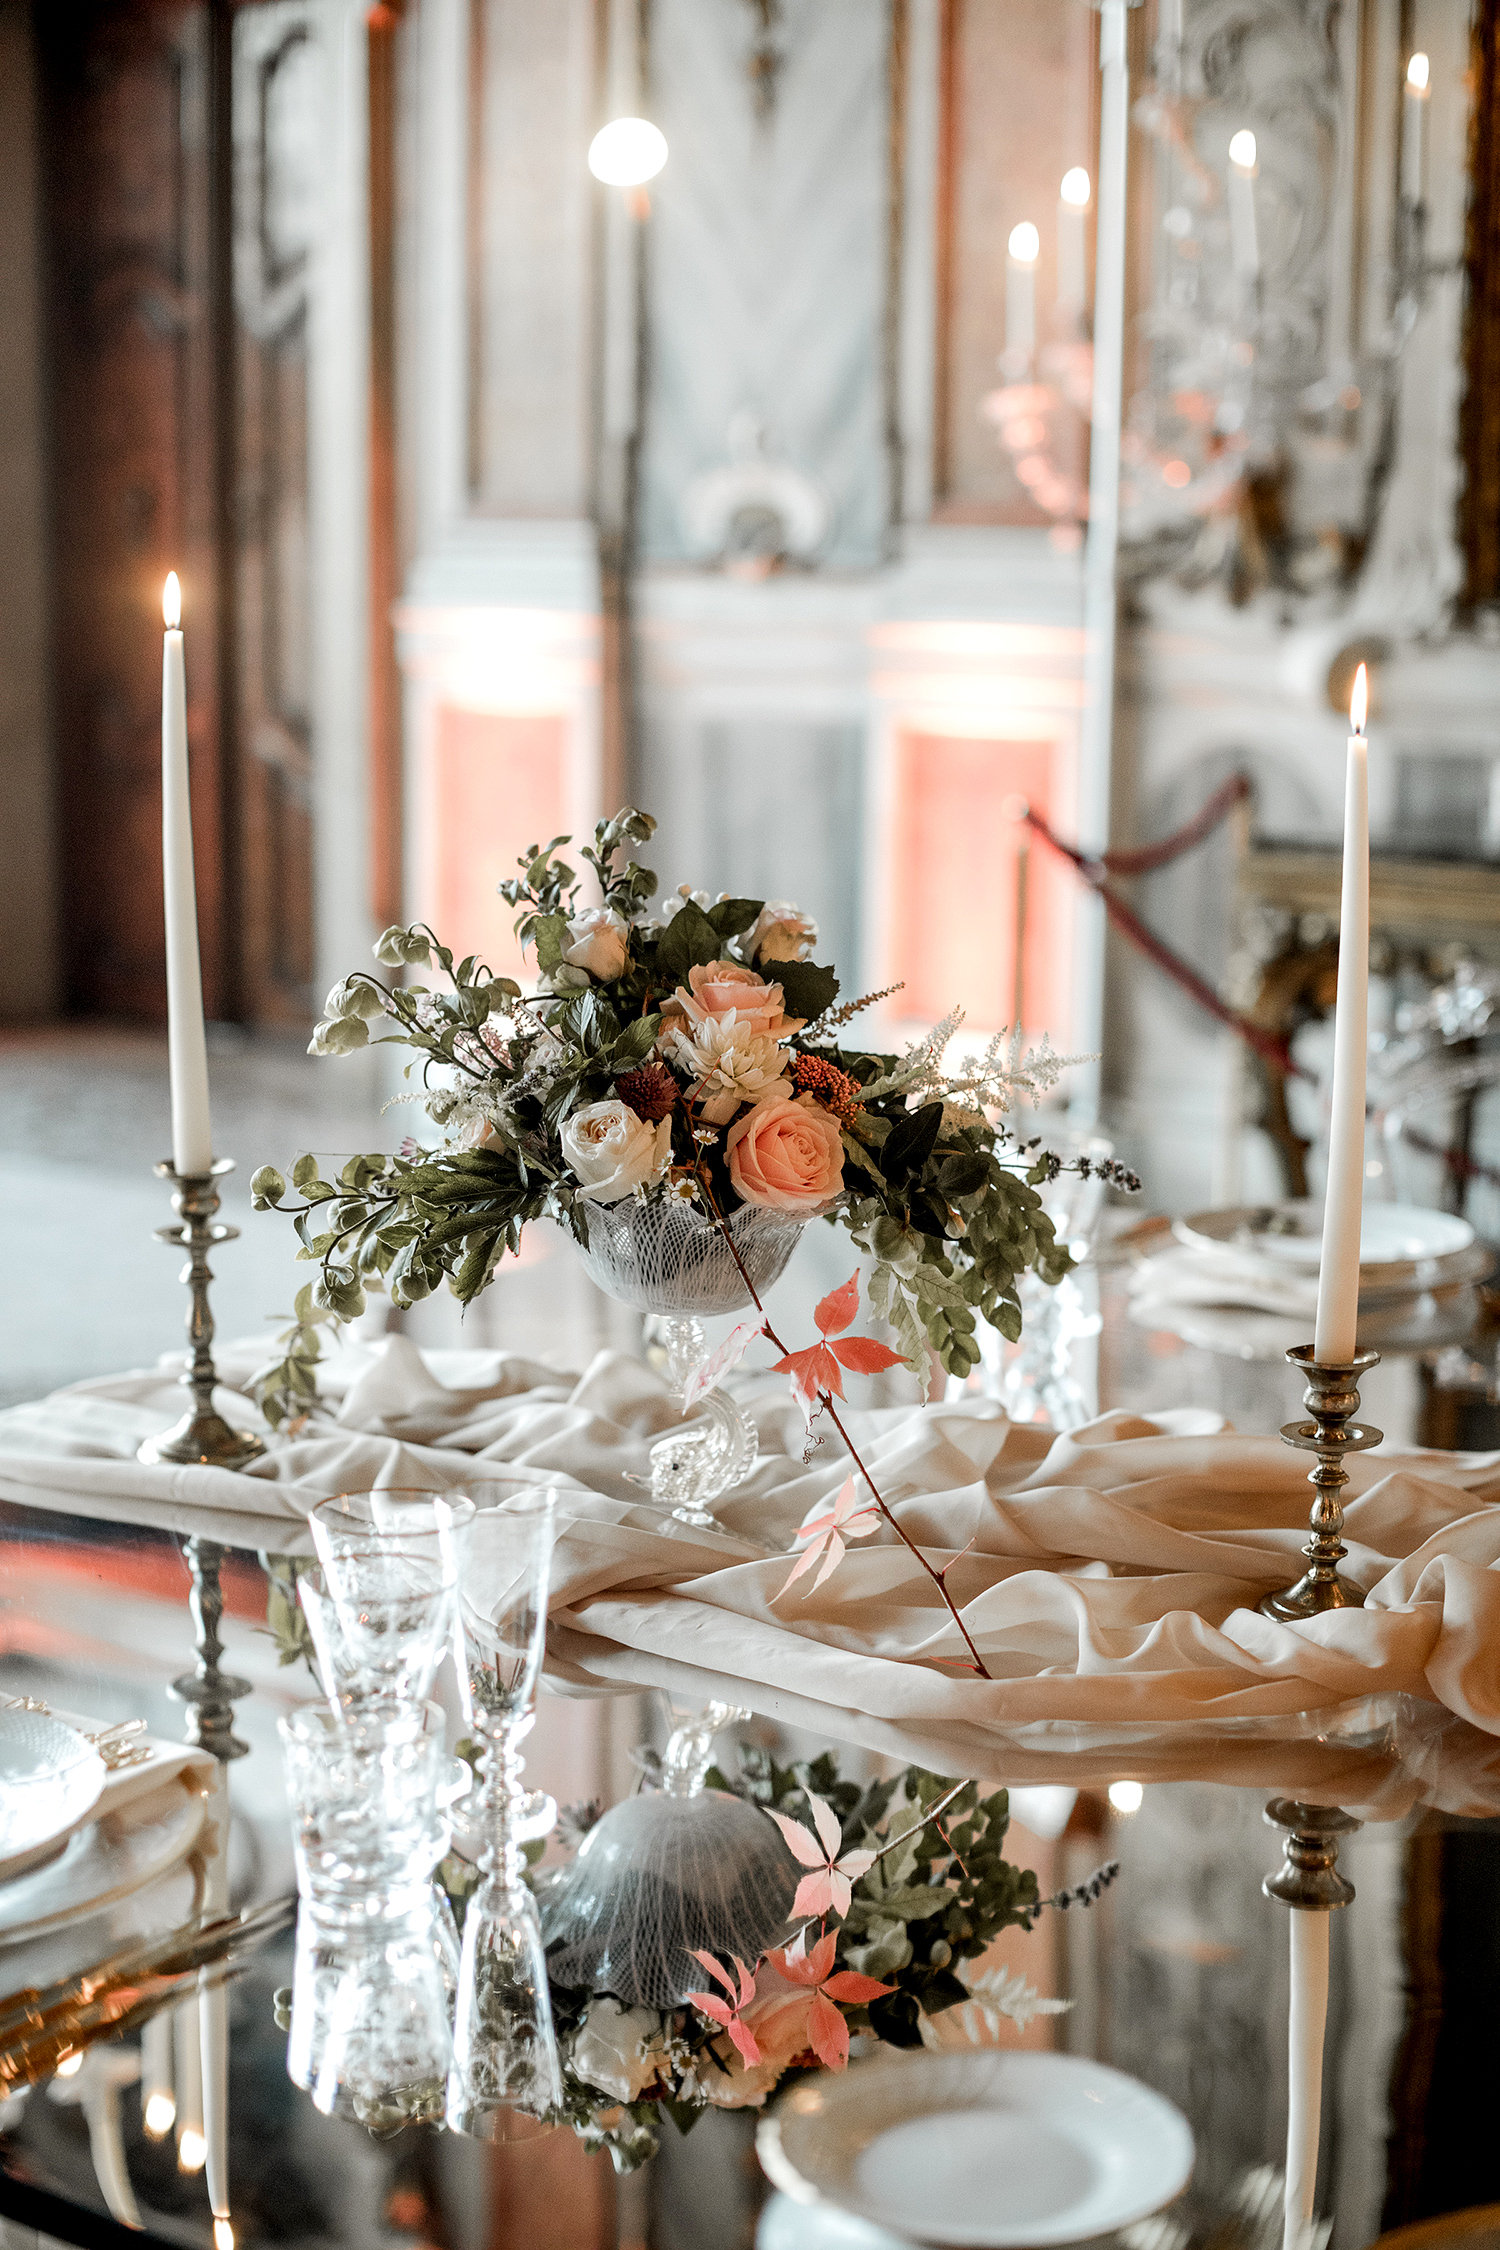 elle raymond venice wedding table centerpiece